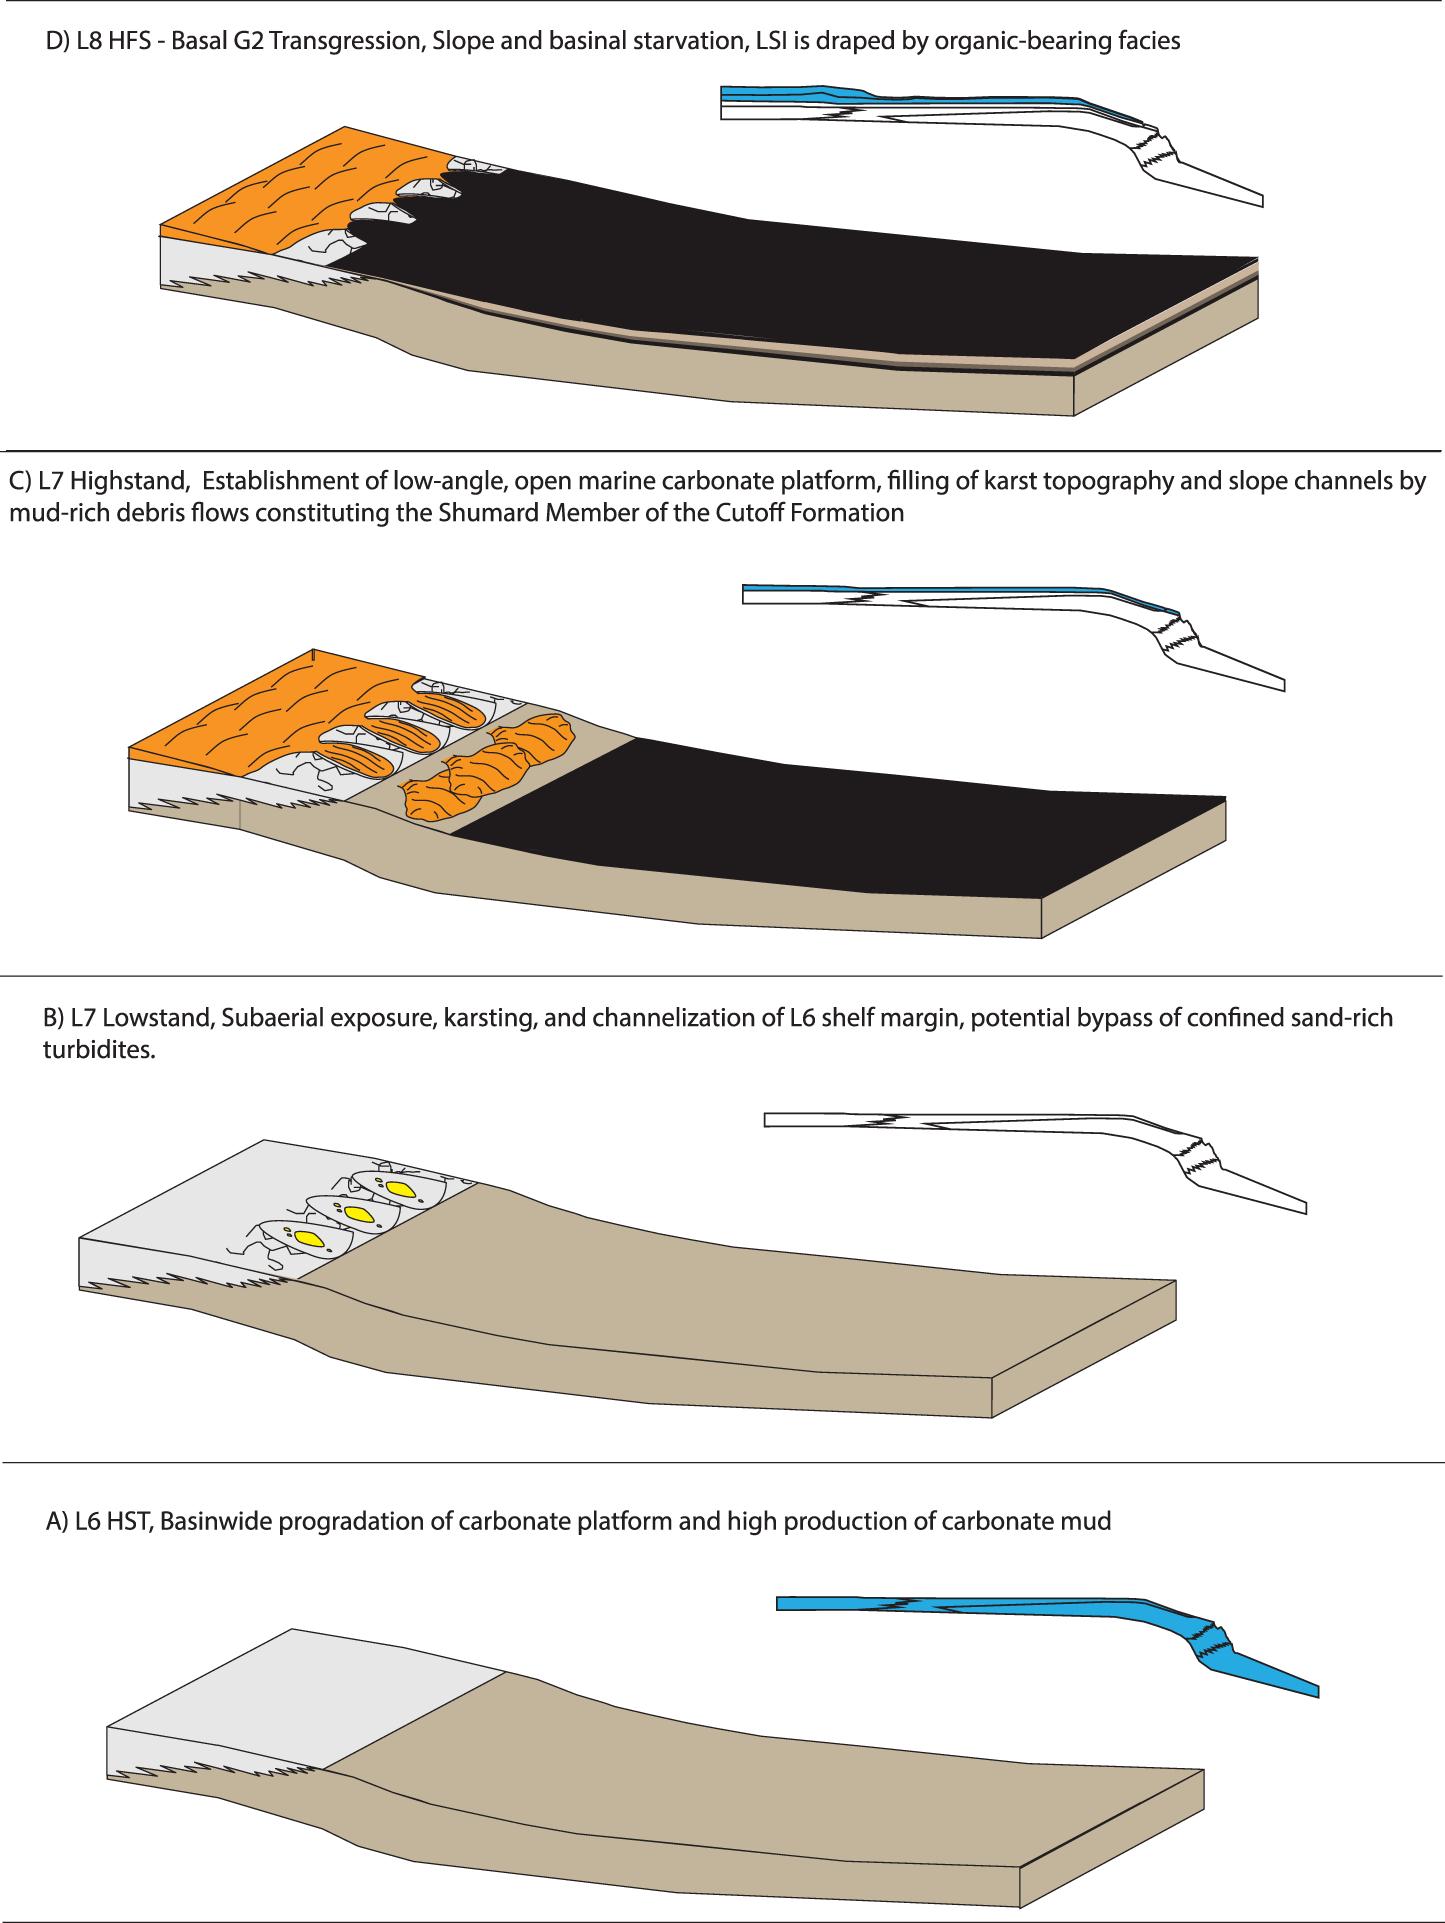 Large Scale Inflections In Slope Angle Below The Shelf Break A Austin Flats Laken Beige 37 View Largedownload Slide